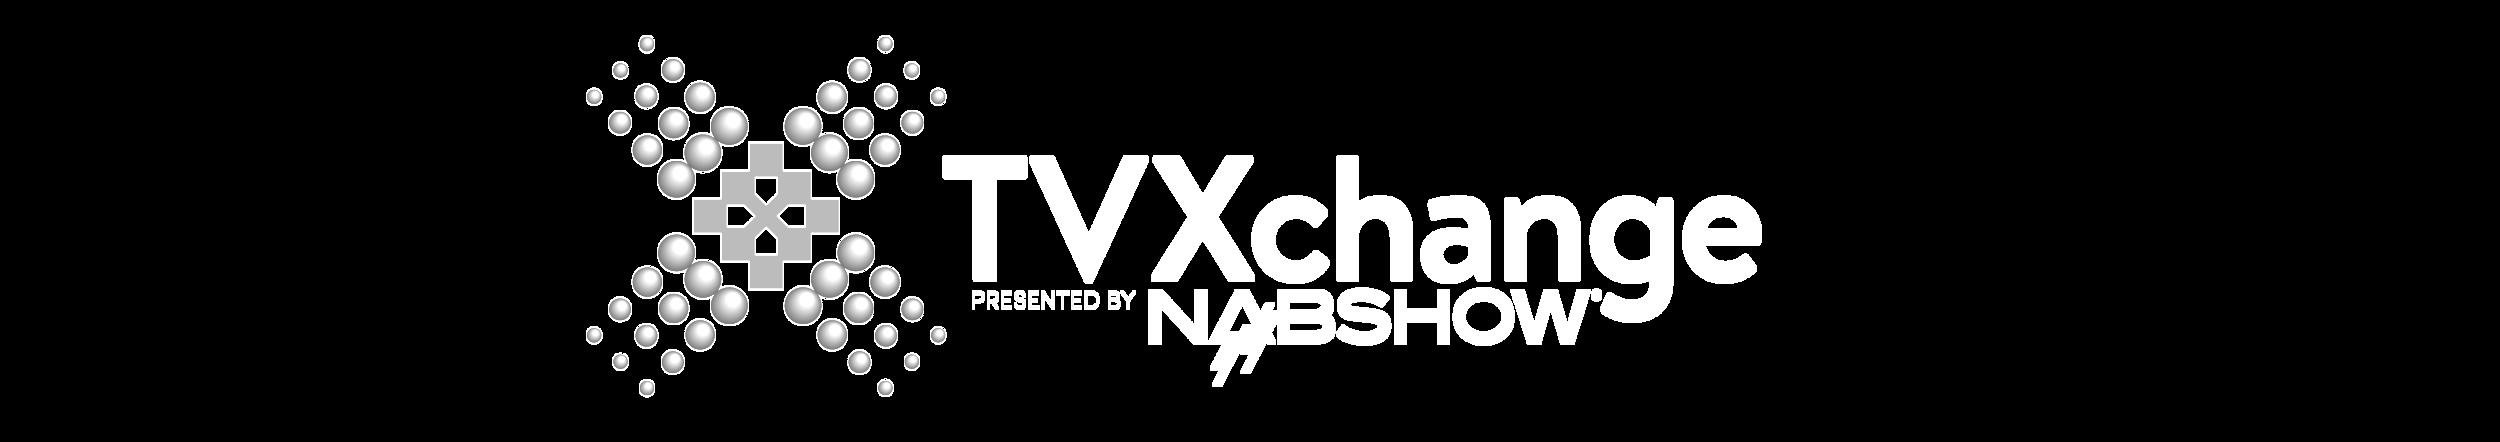 NABShow TVXchange _ White.png